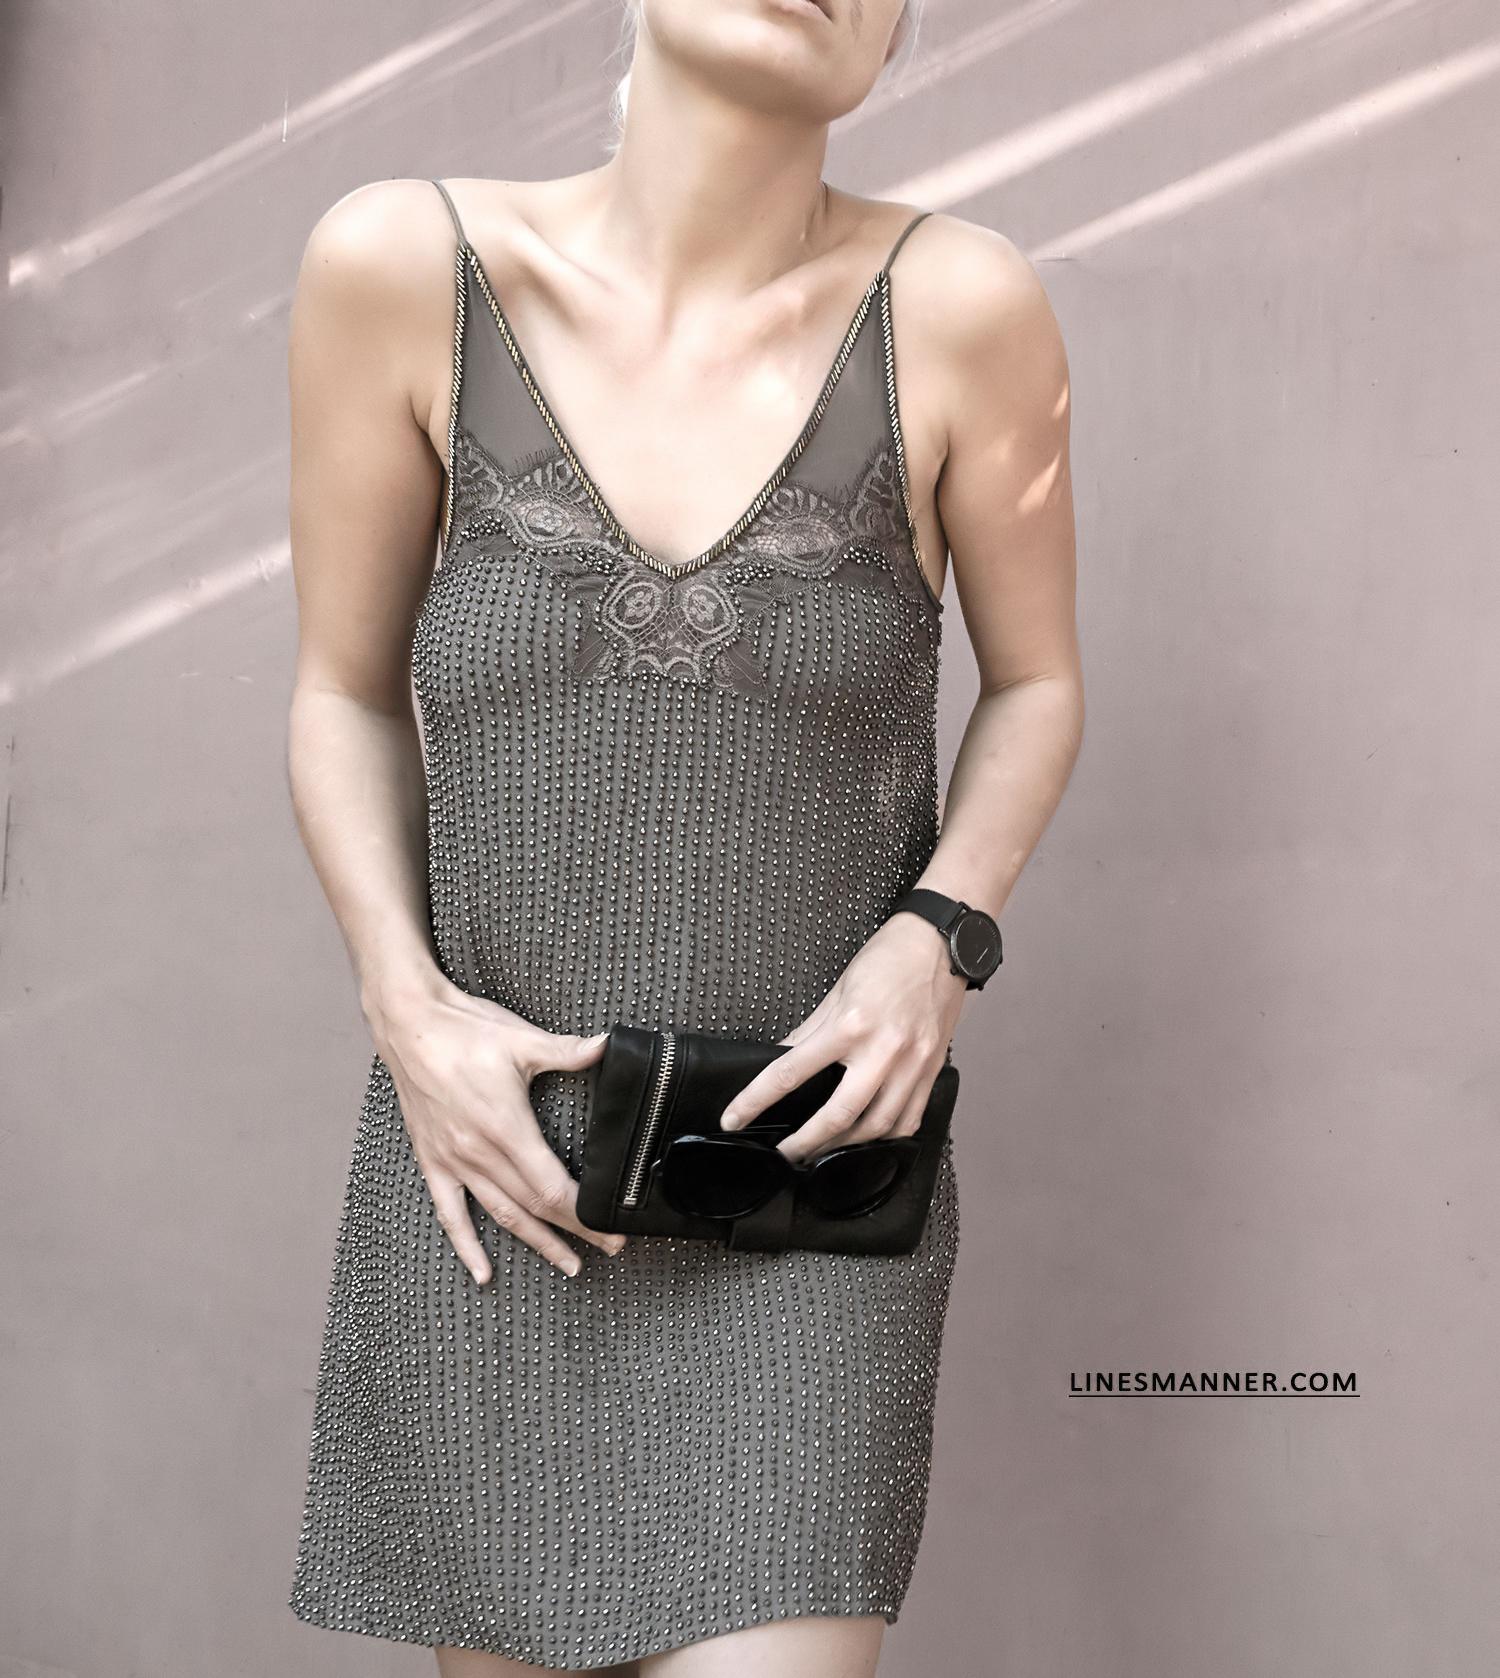 Lines-Manner-Magali_Pascal-Boheme-Chic-Minimalist-Bare_Minimal-Essential-Effortless-Details-Organic-Luxurious-Silk-Dress-Lace-13